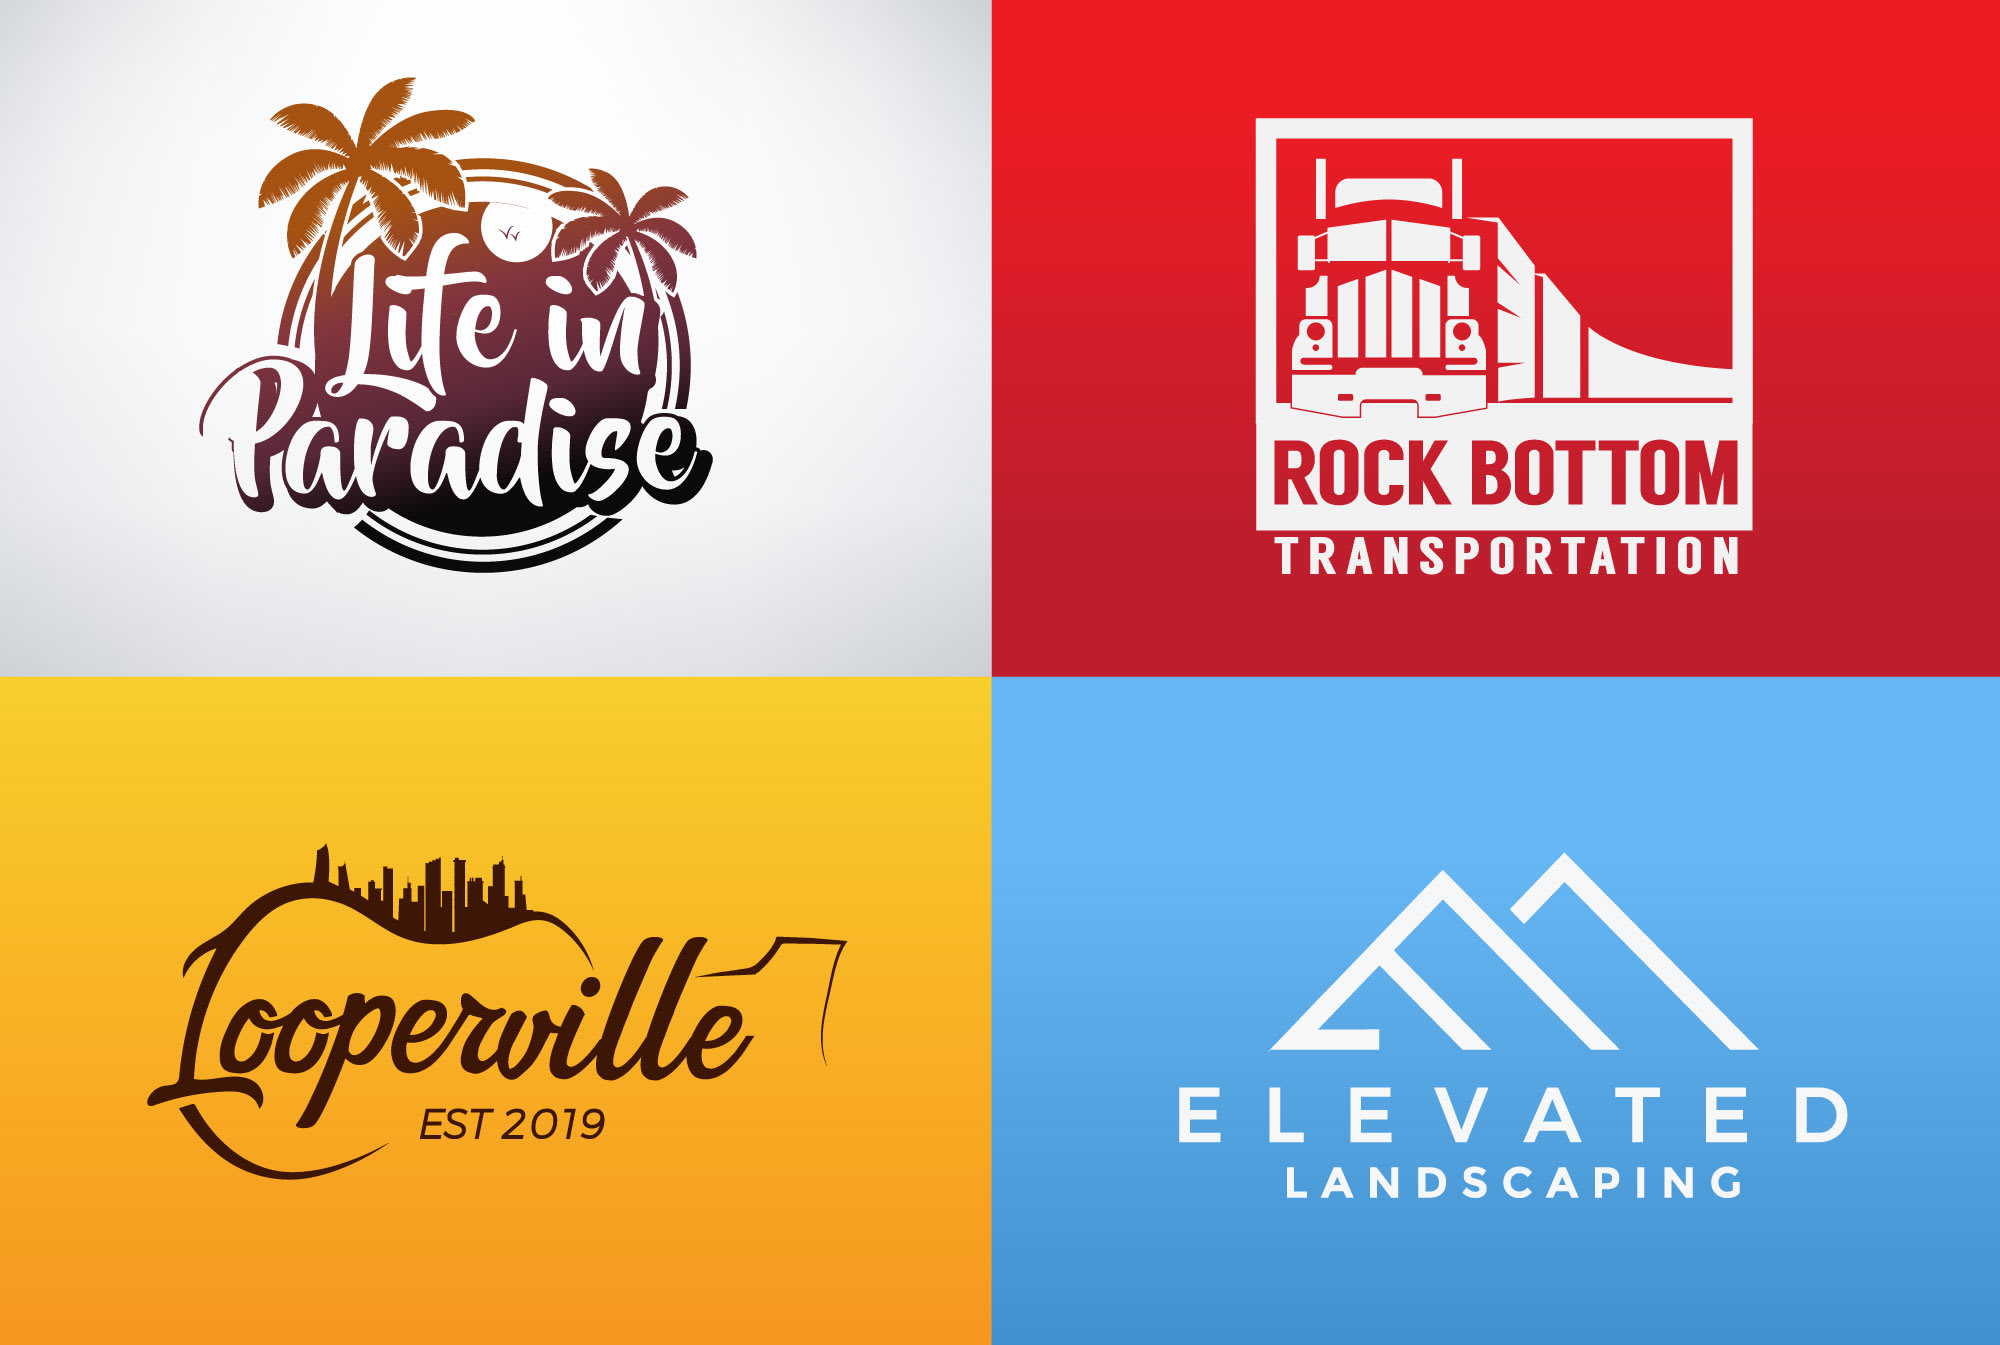 I will create a professional minimalist logo design